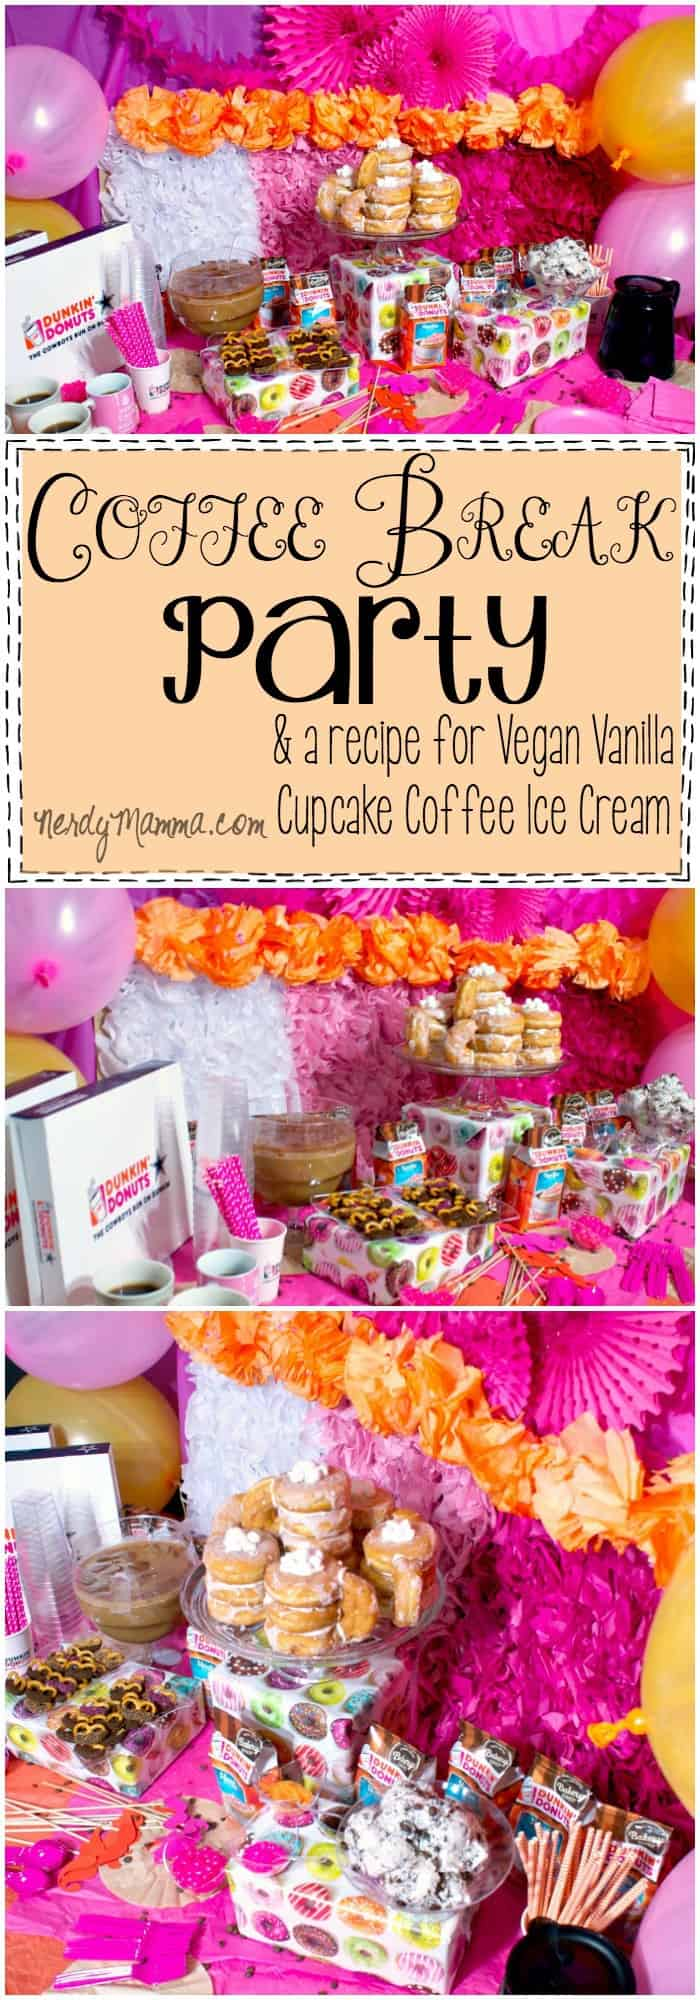 What a FUN idea! It's a Coffee Break Party and a yummy recipe for vegan vanilla cupcake coffee ice cream. I love it!